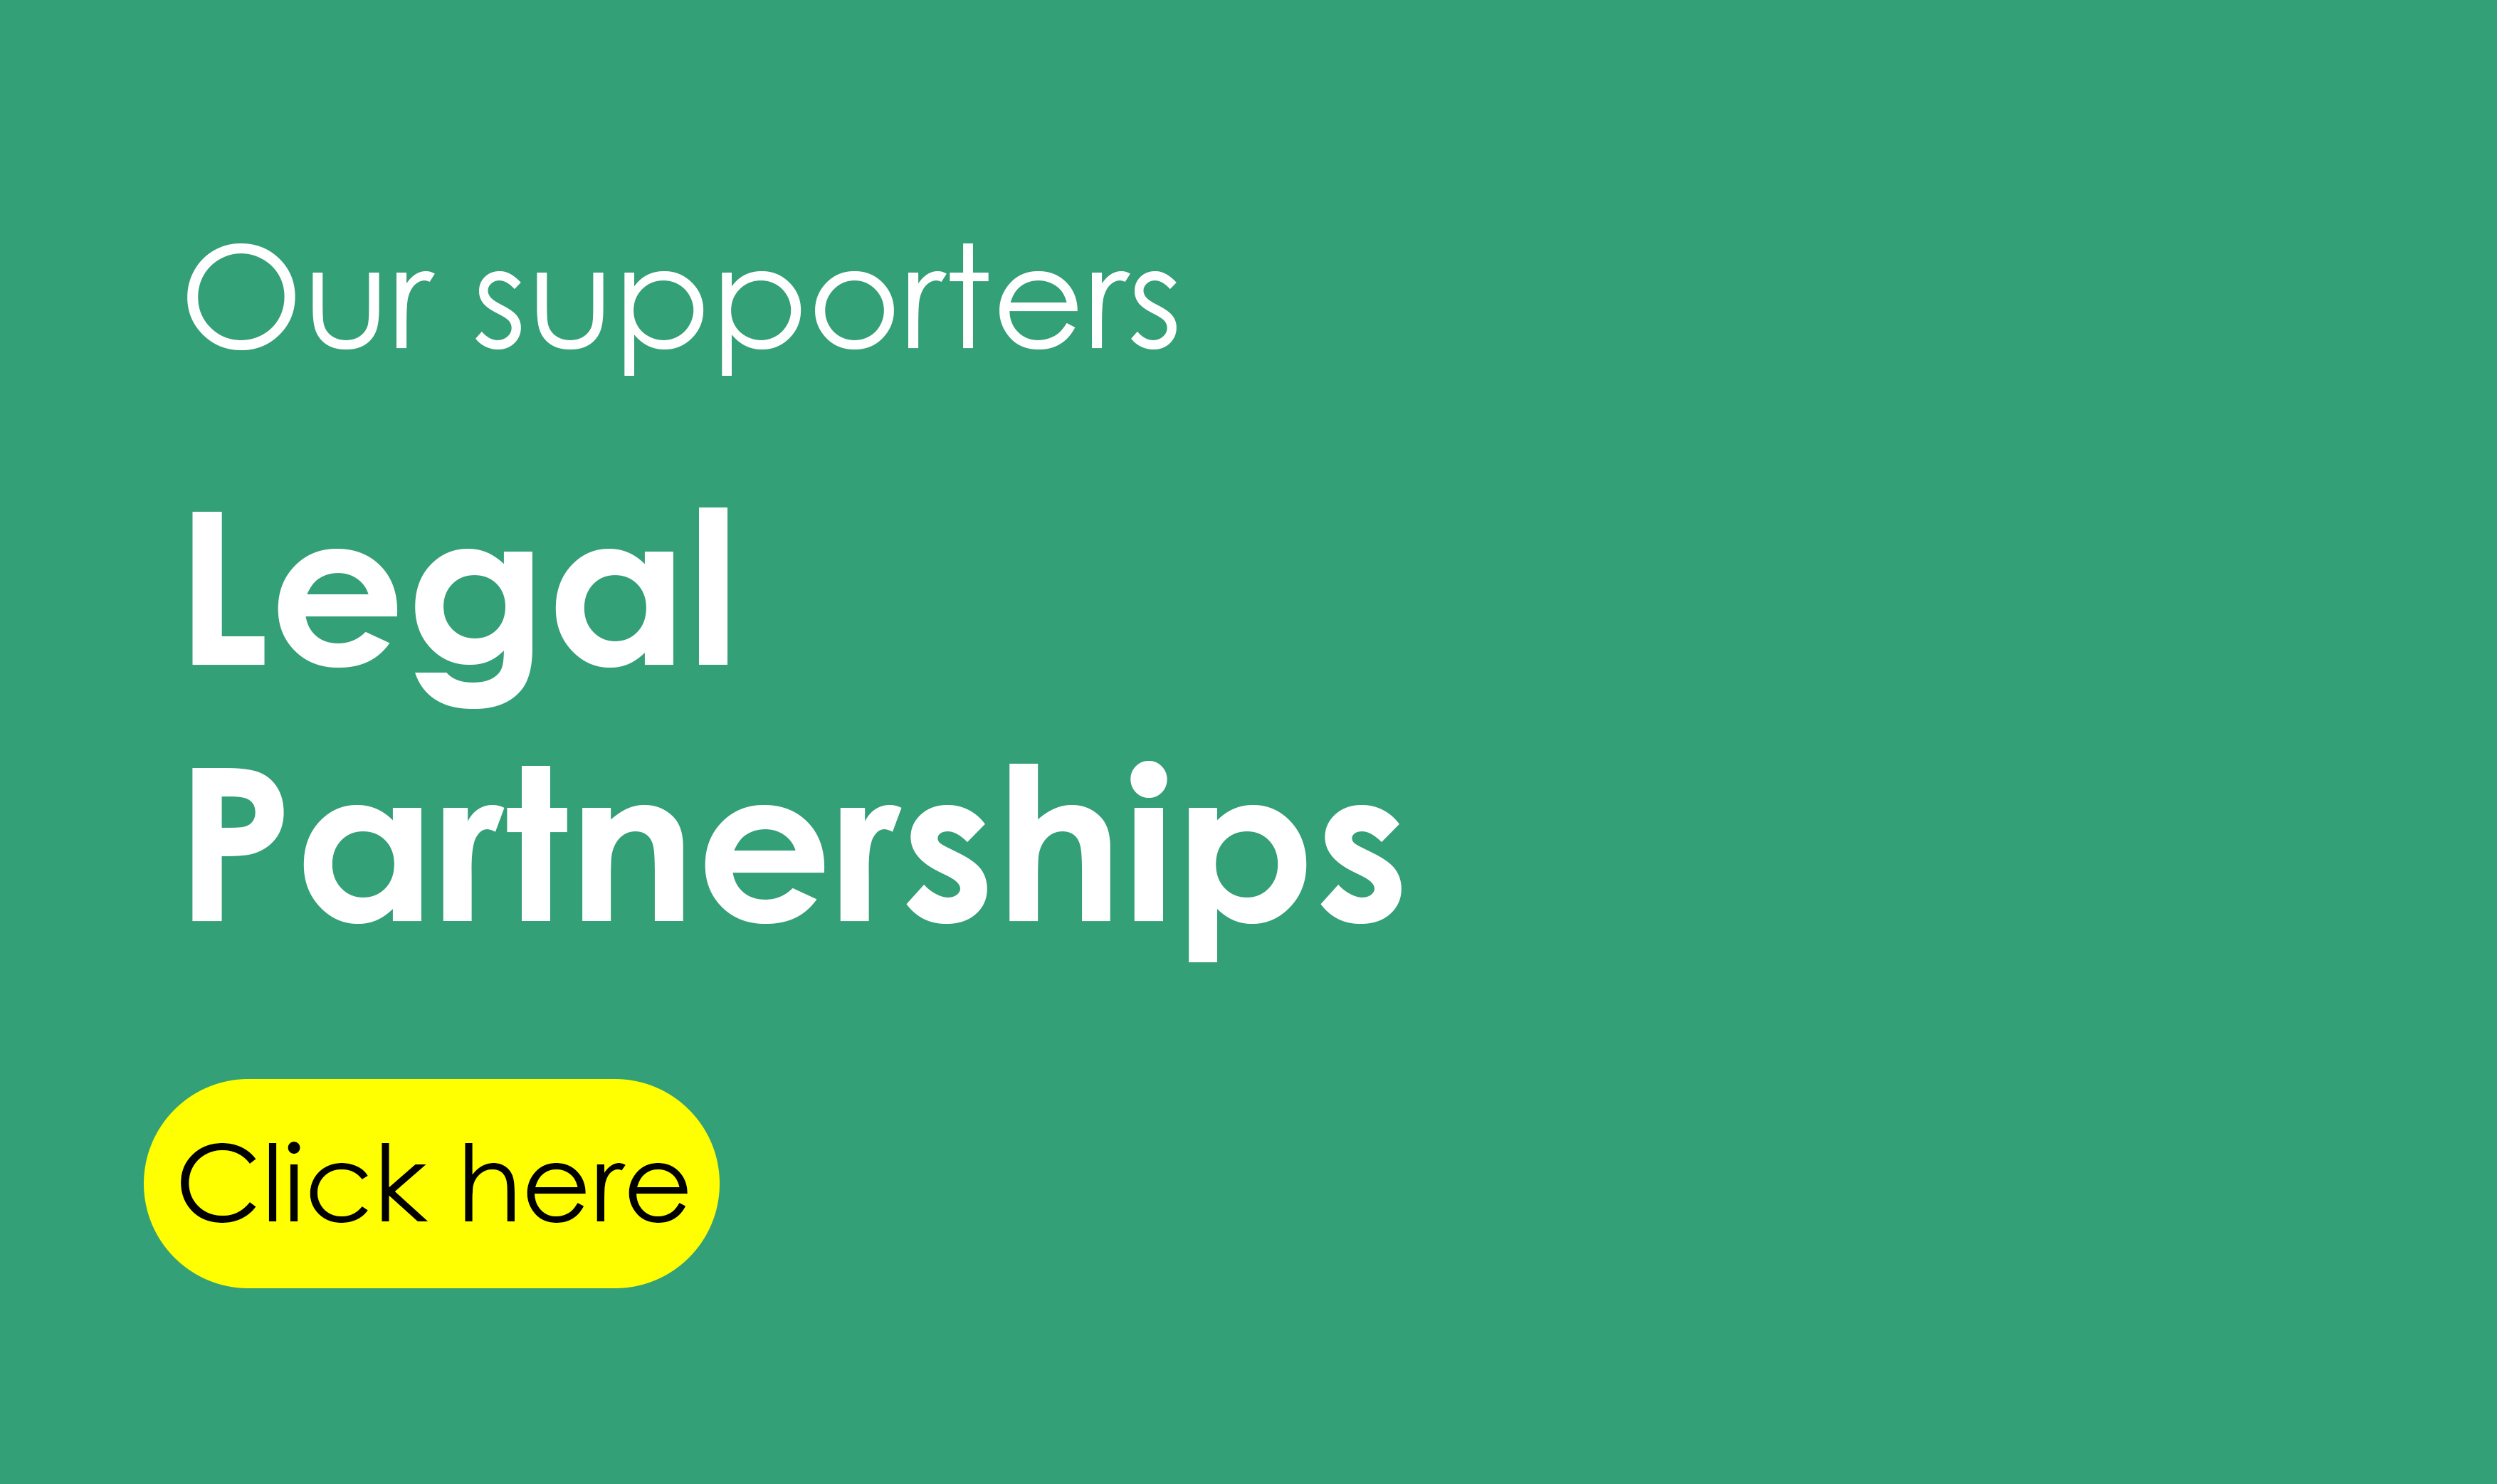 Legal Partnerships